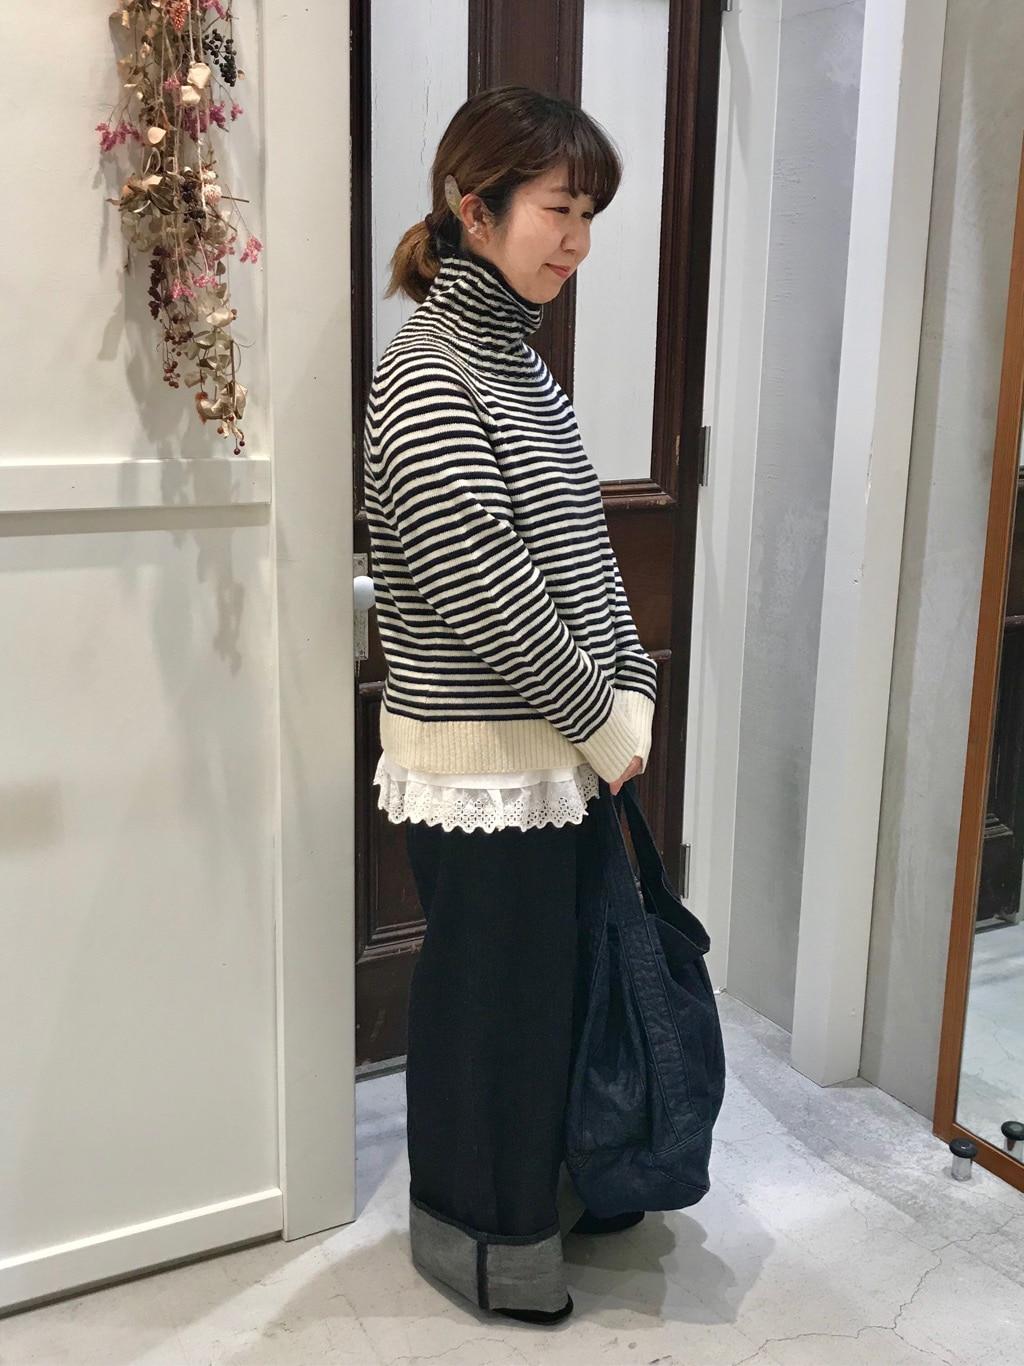 chambre de charme キラリナ京王吉祥寺 身長:155cm 2020.11.19